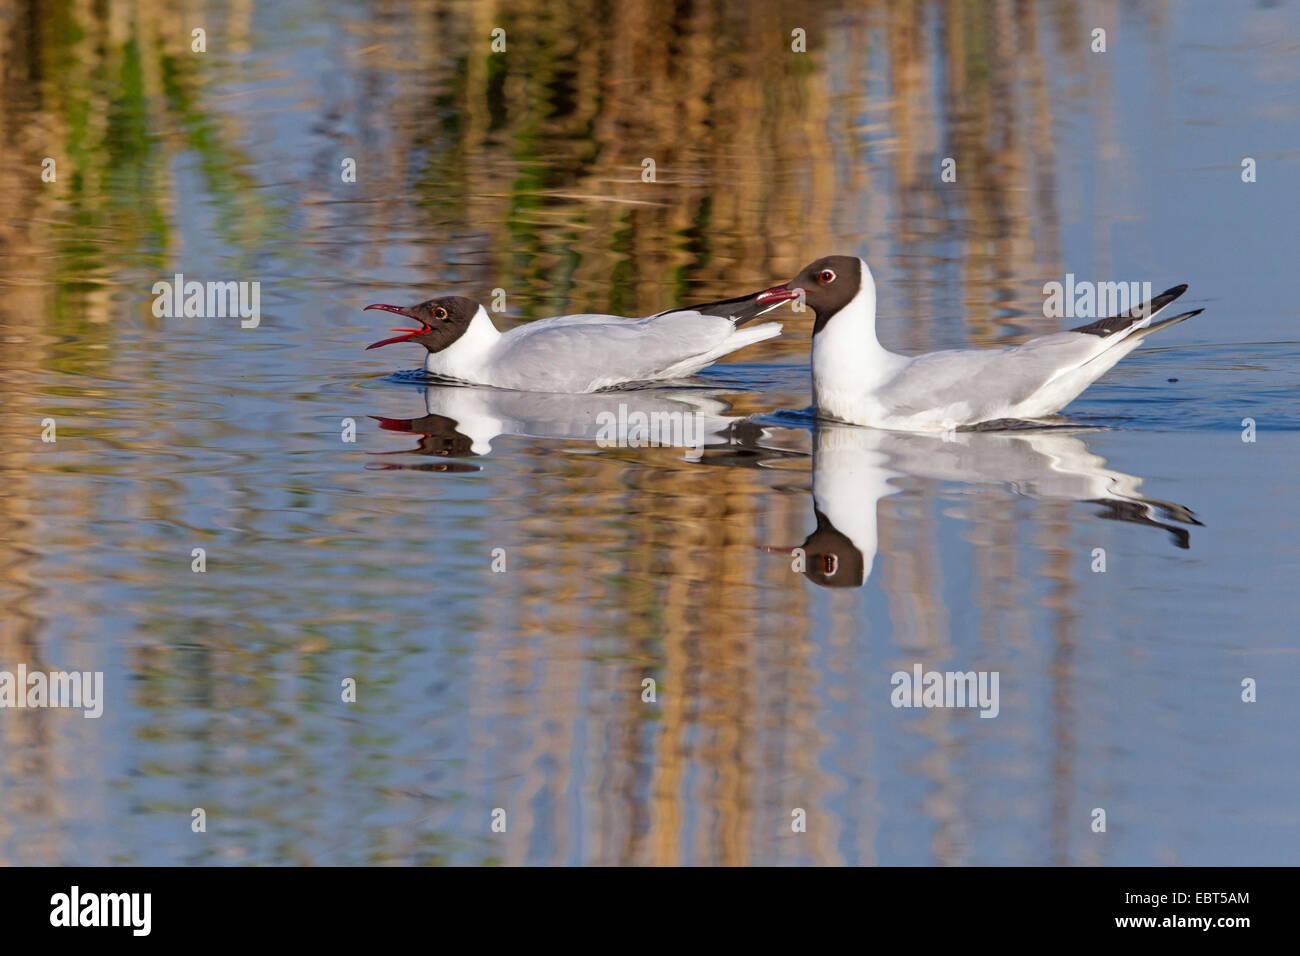 black-headed gull (Larus ridibundus, Chroicocephalus ridibundus), two black-headed gulls swimming together on the Stock Photo